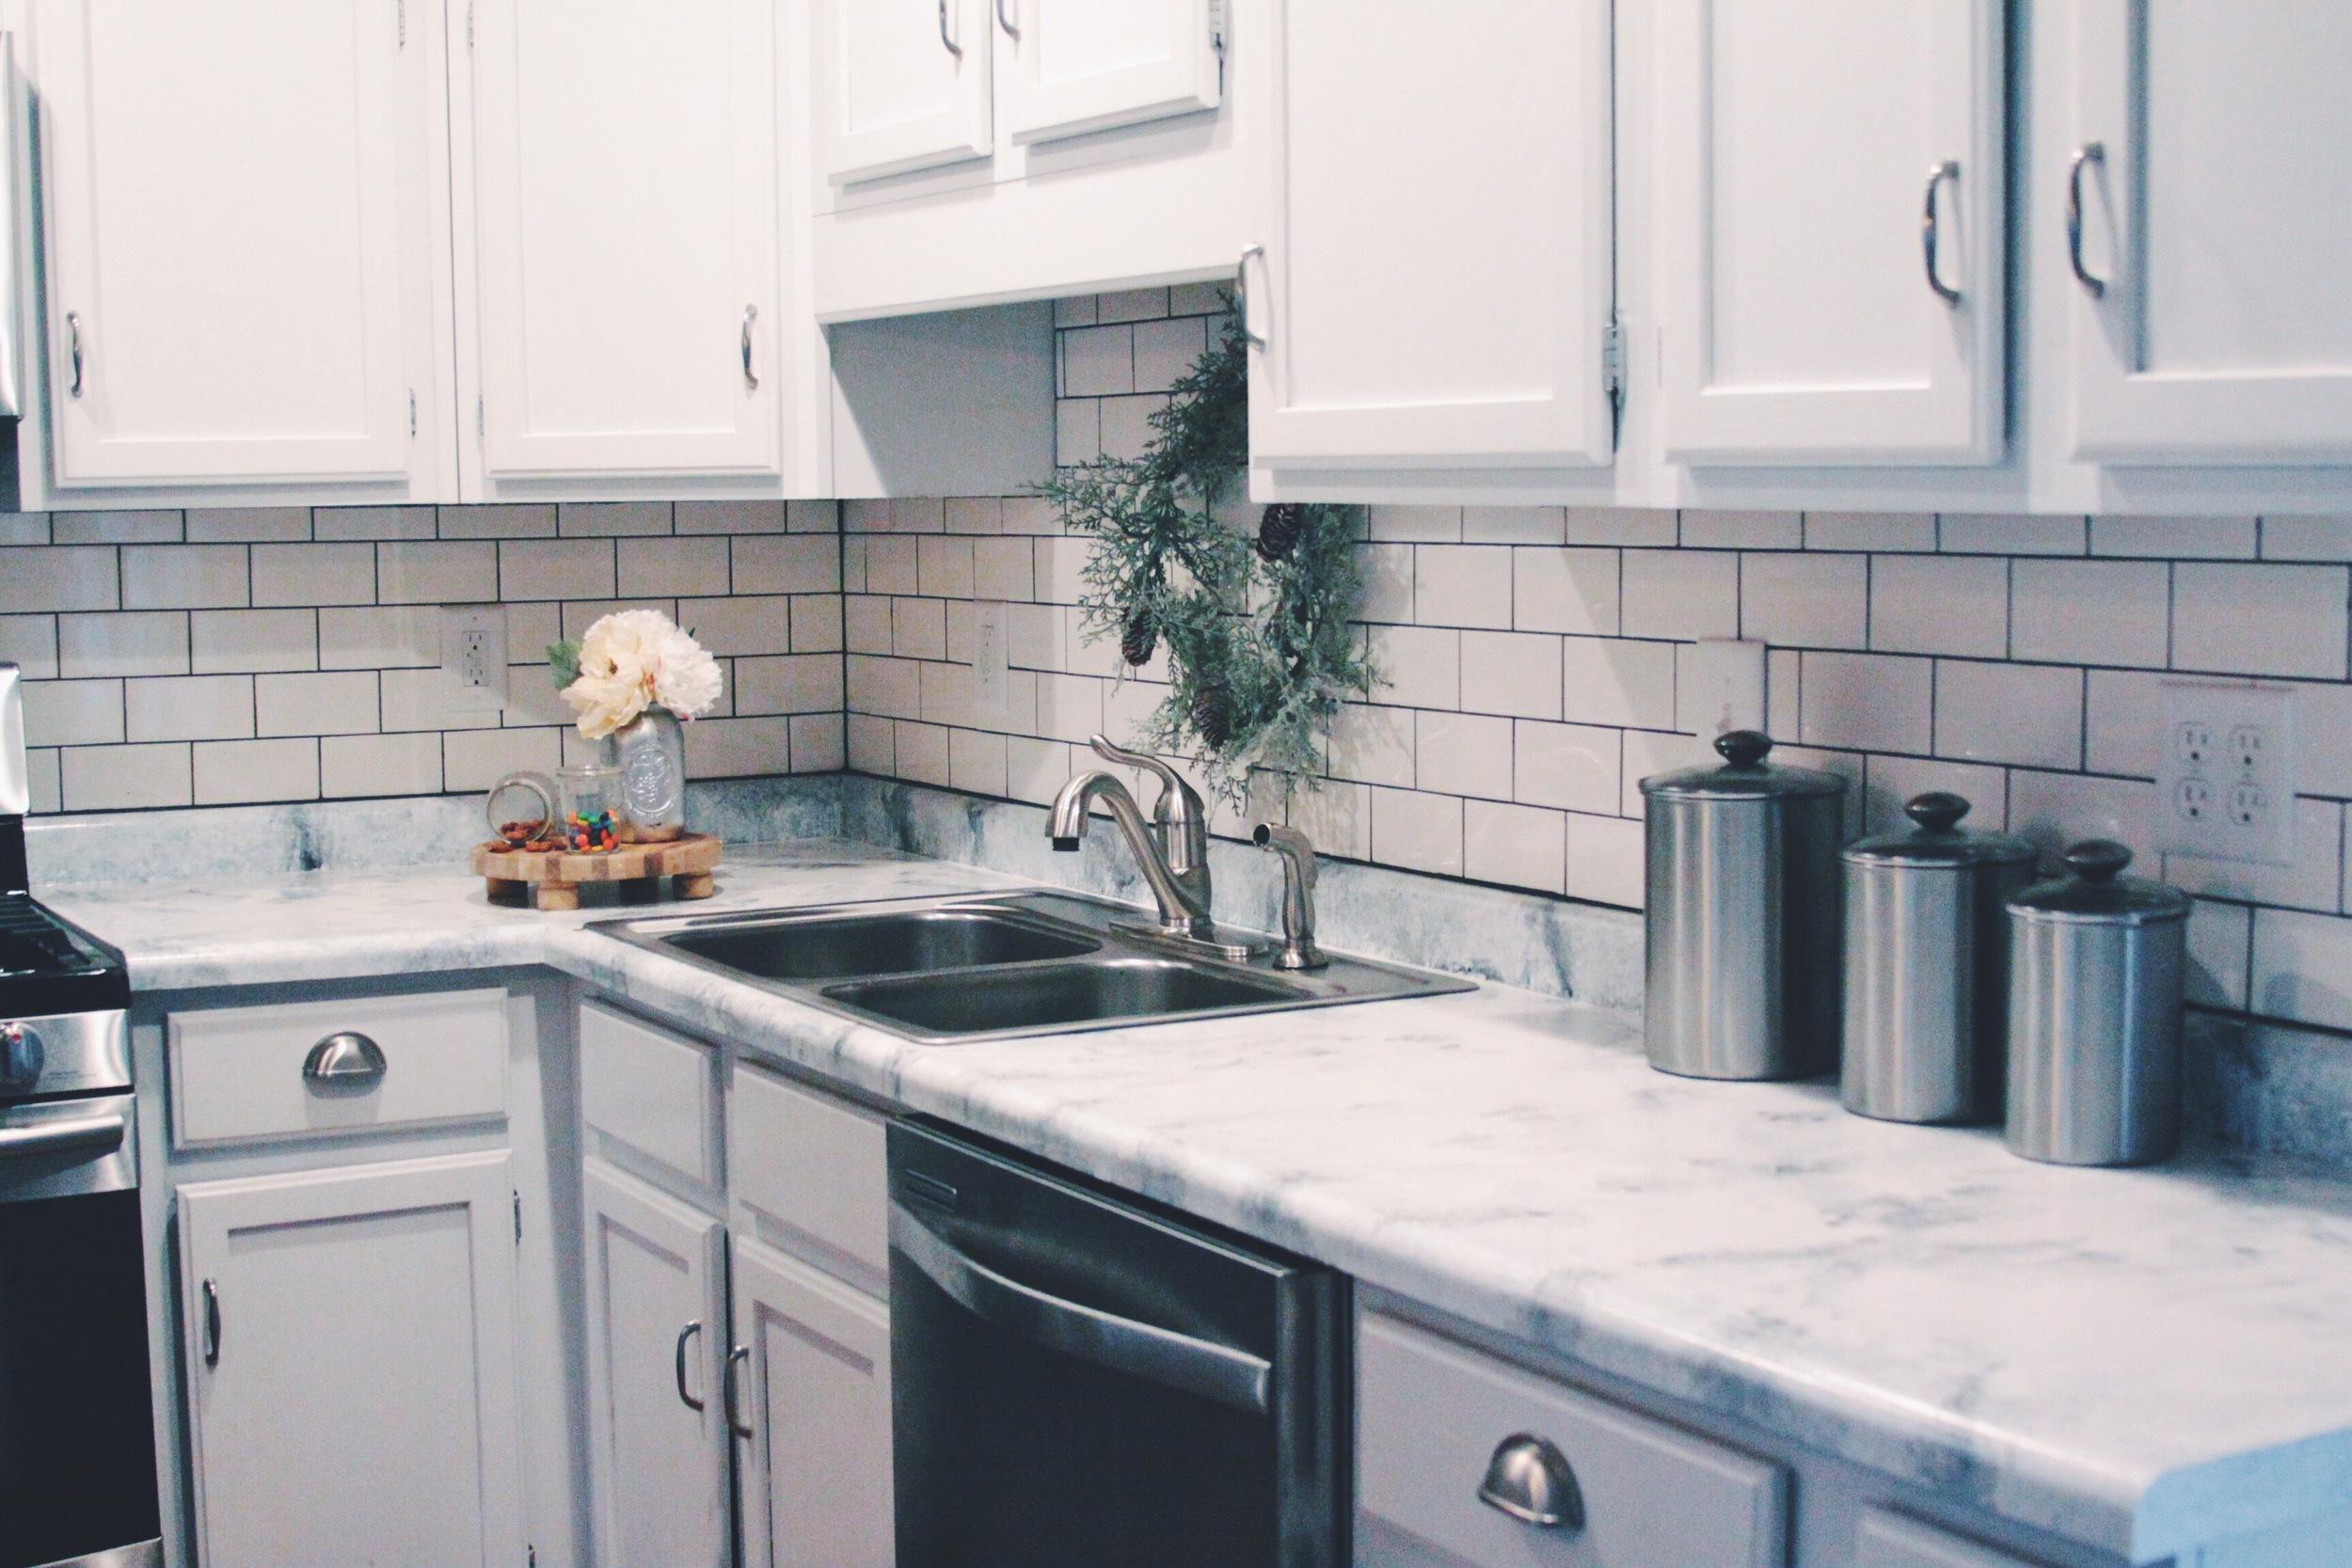 to construction countertops countertop with regarding recycled brown cheapest mikasa custom granite idea kitchen me regard near cheap plans